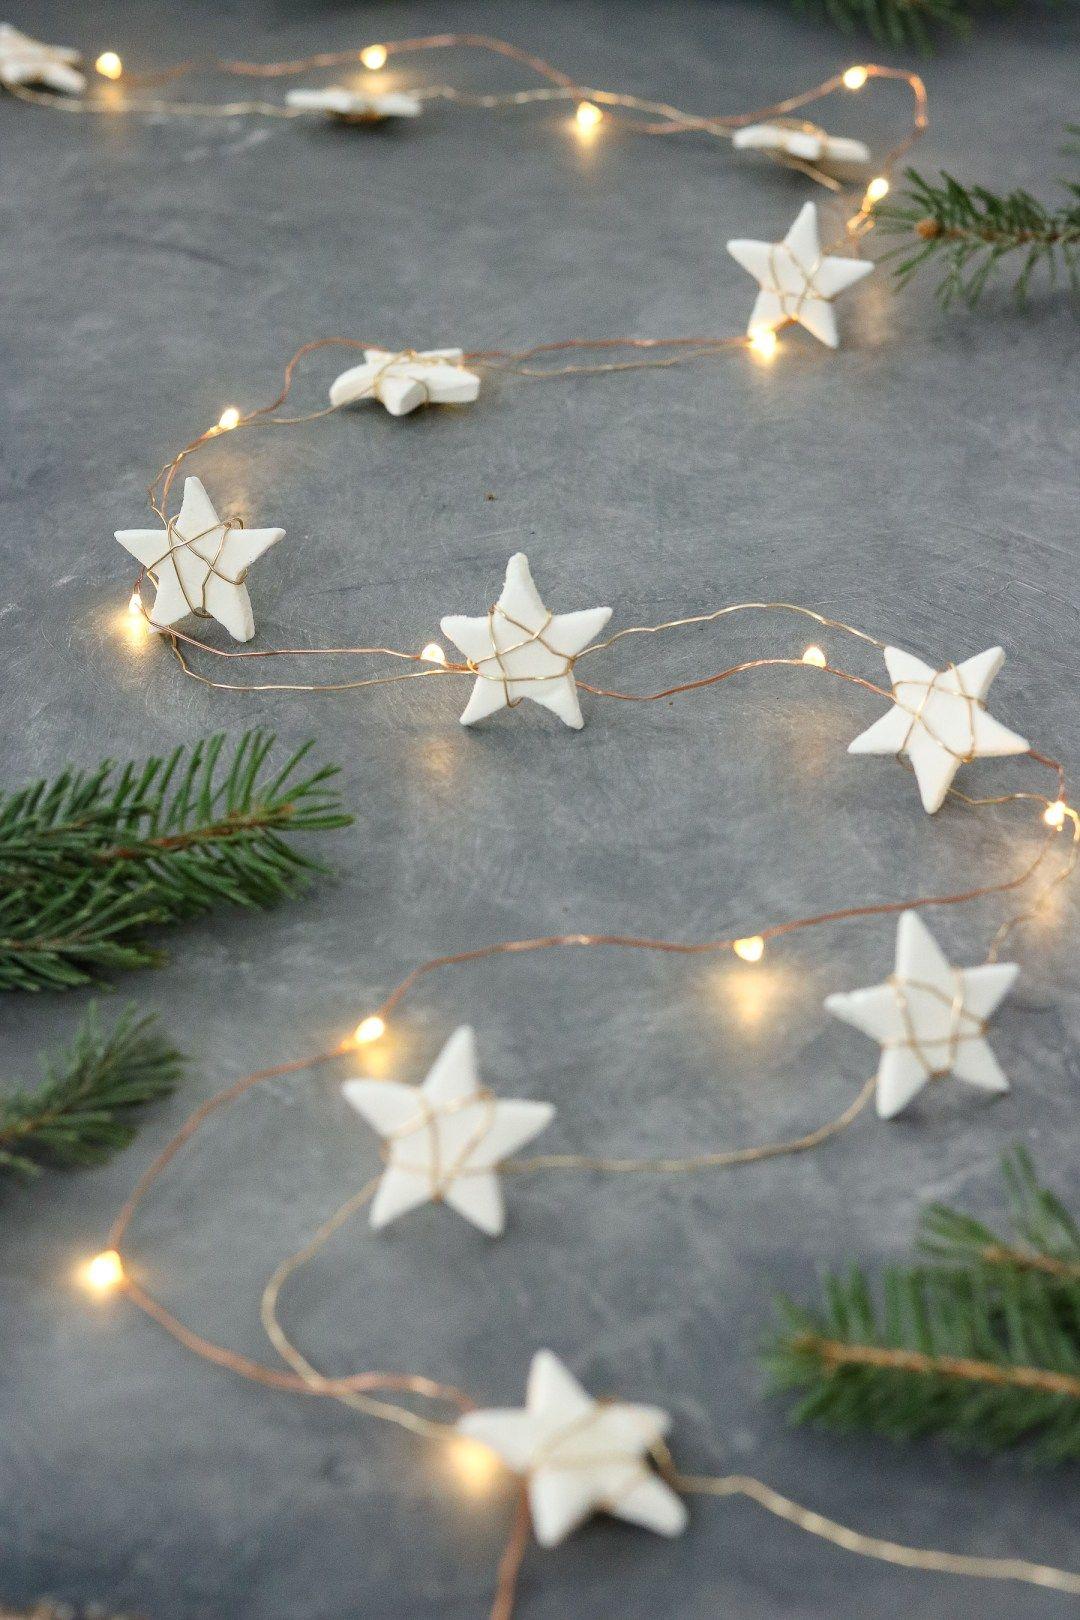 Photo of Star Garland DIY+ 5 Minute Recipe | Baking Soda + Cornstarch | Lily Ardor